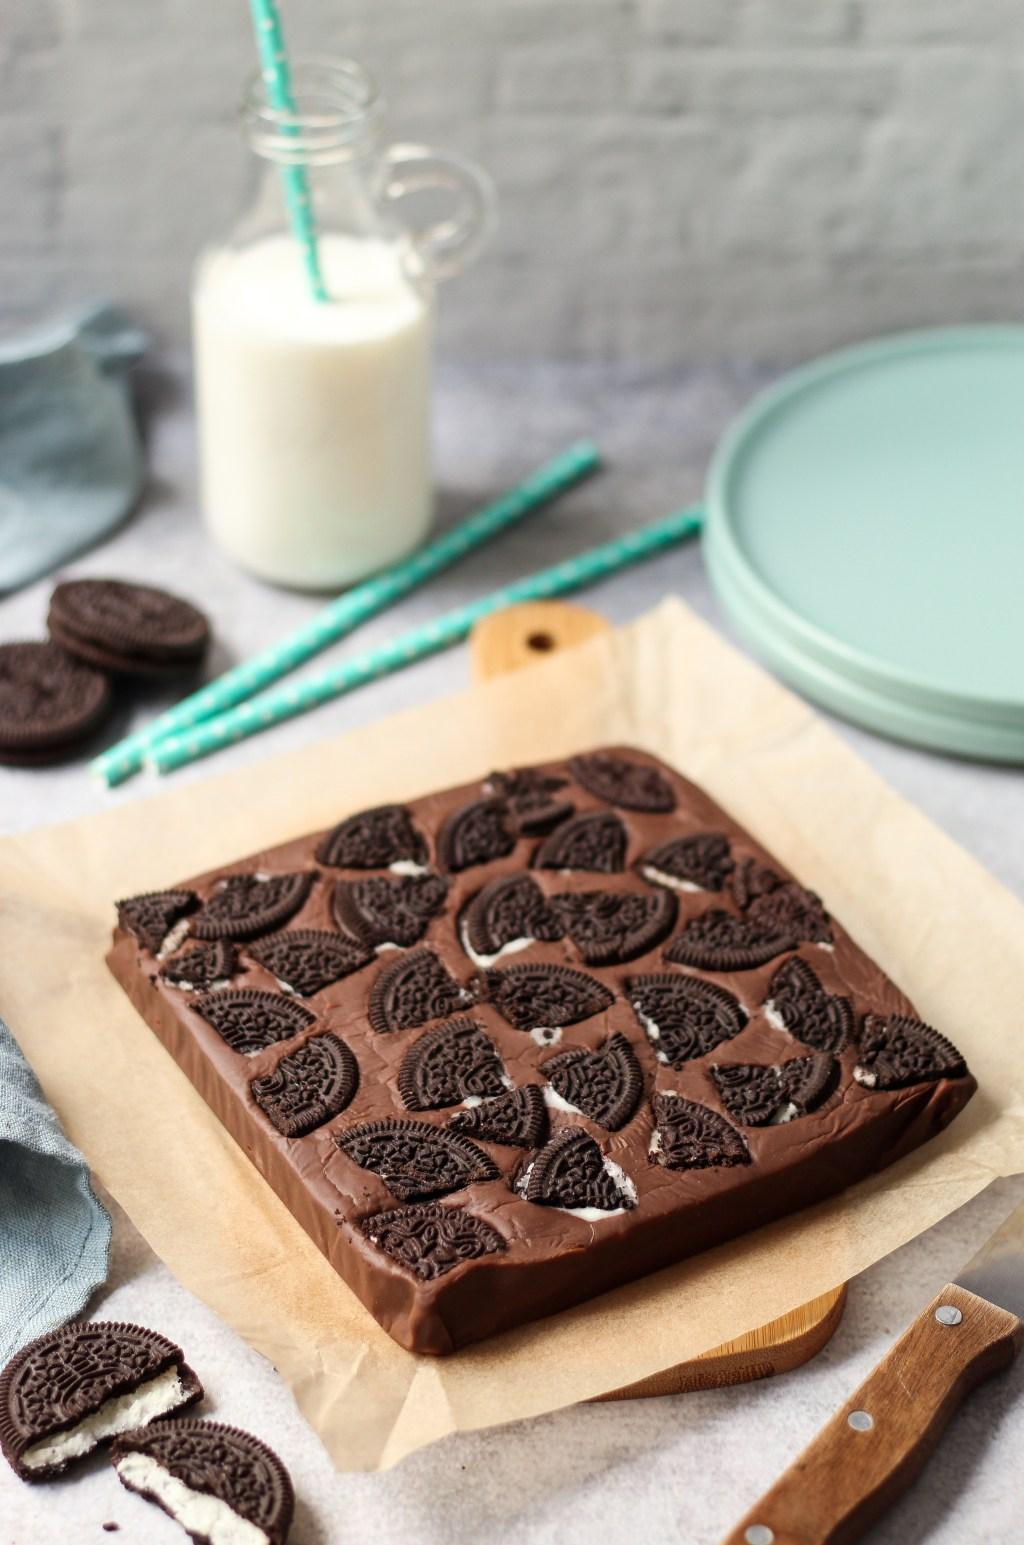 Čokoladne kocke (fudge) sa oreo keksom 1